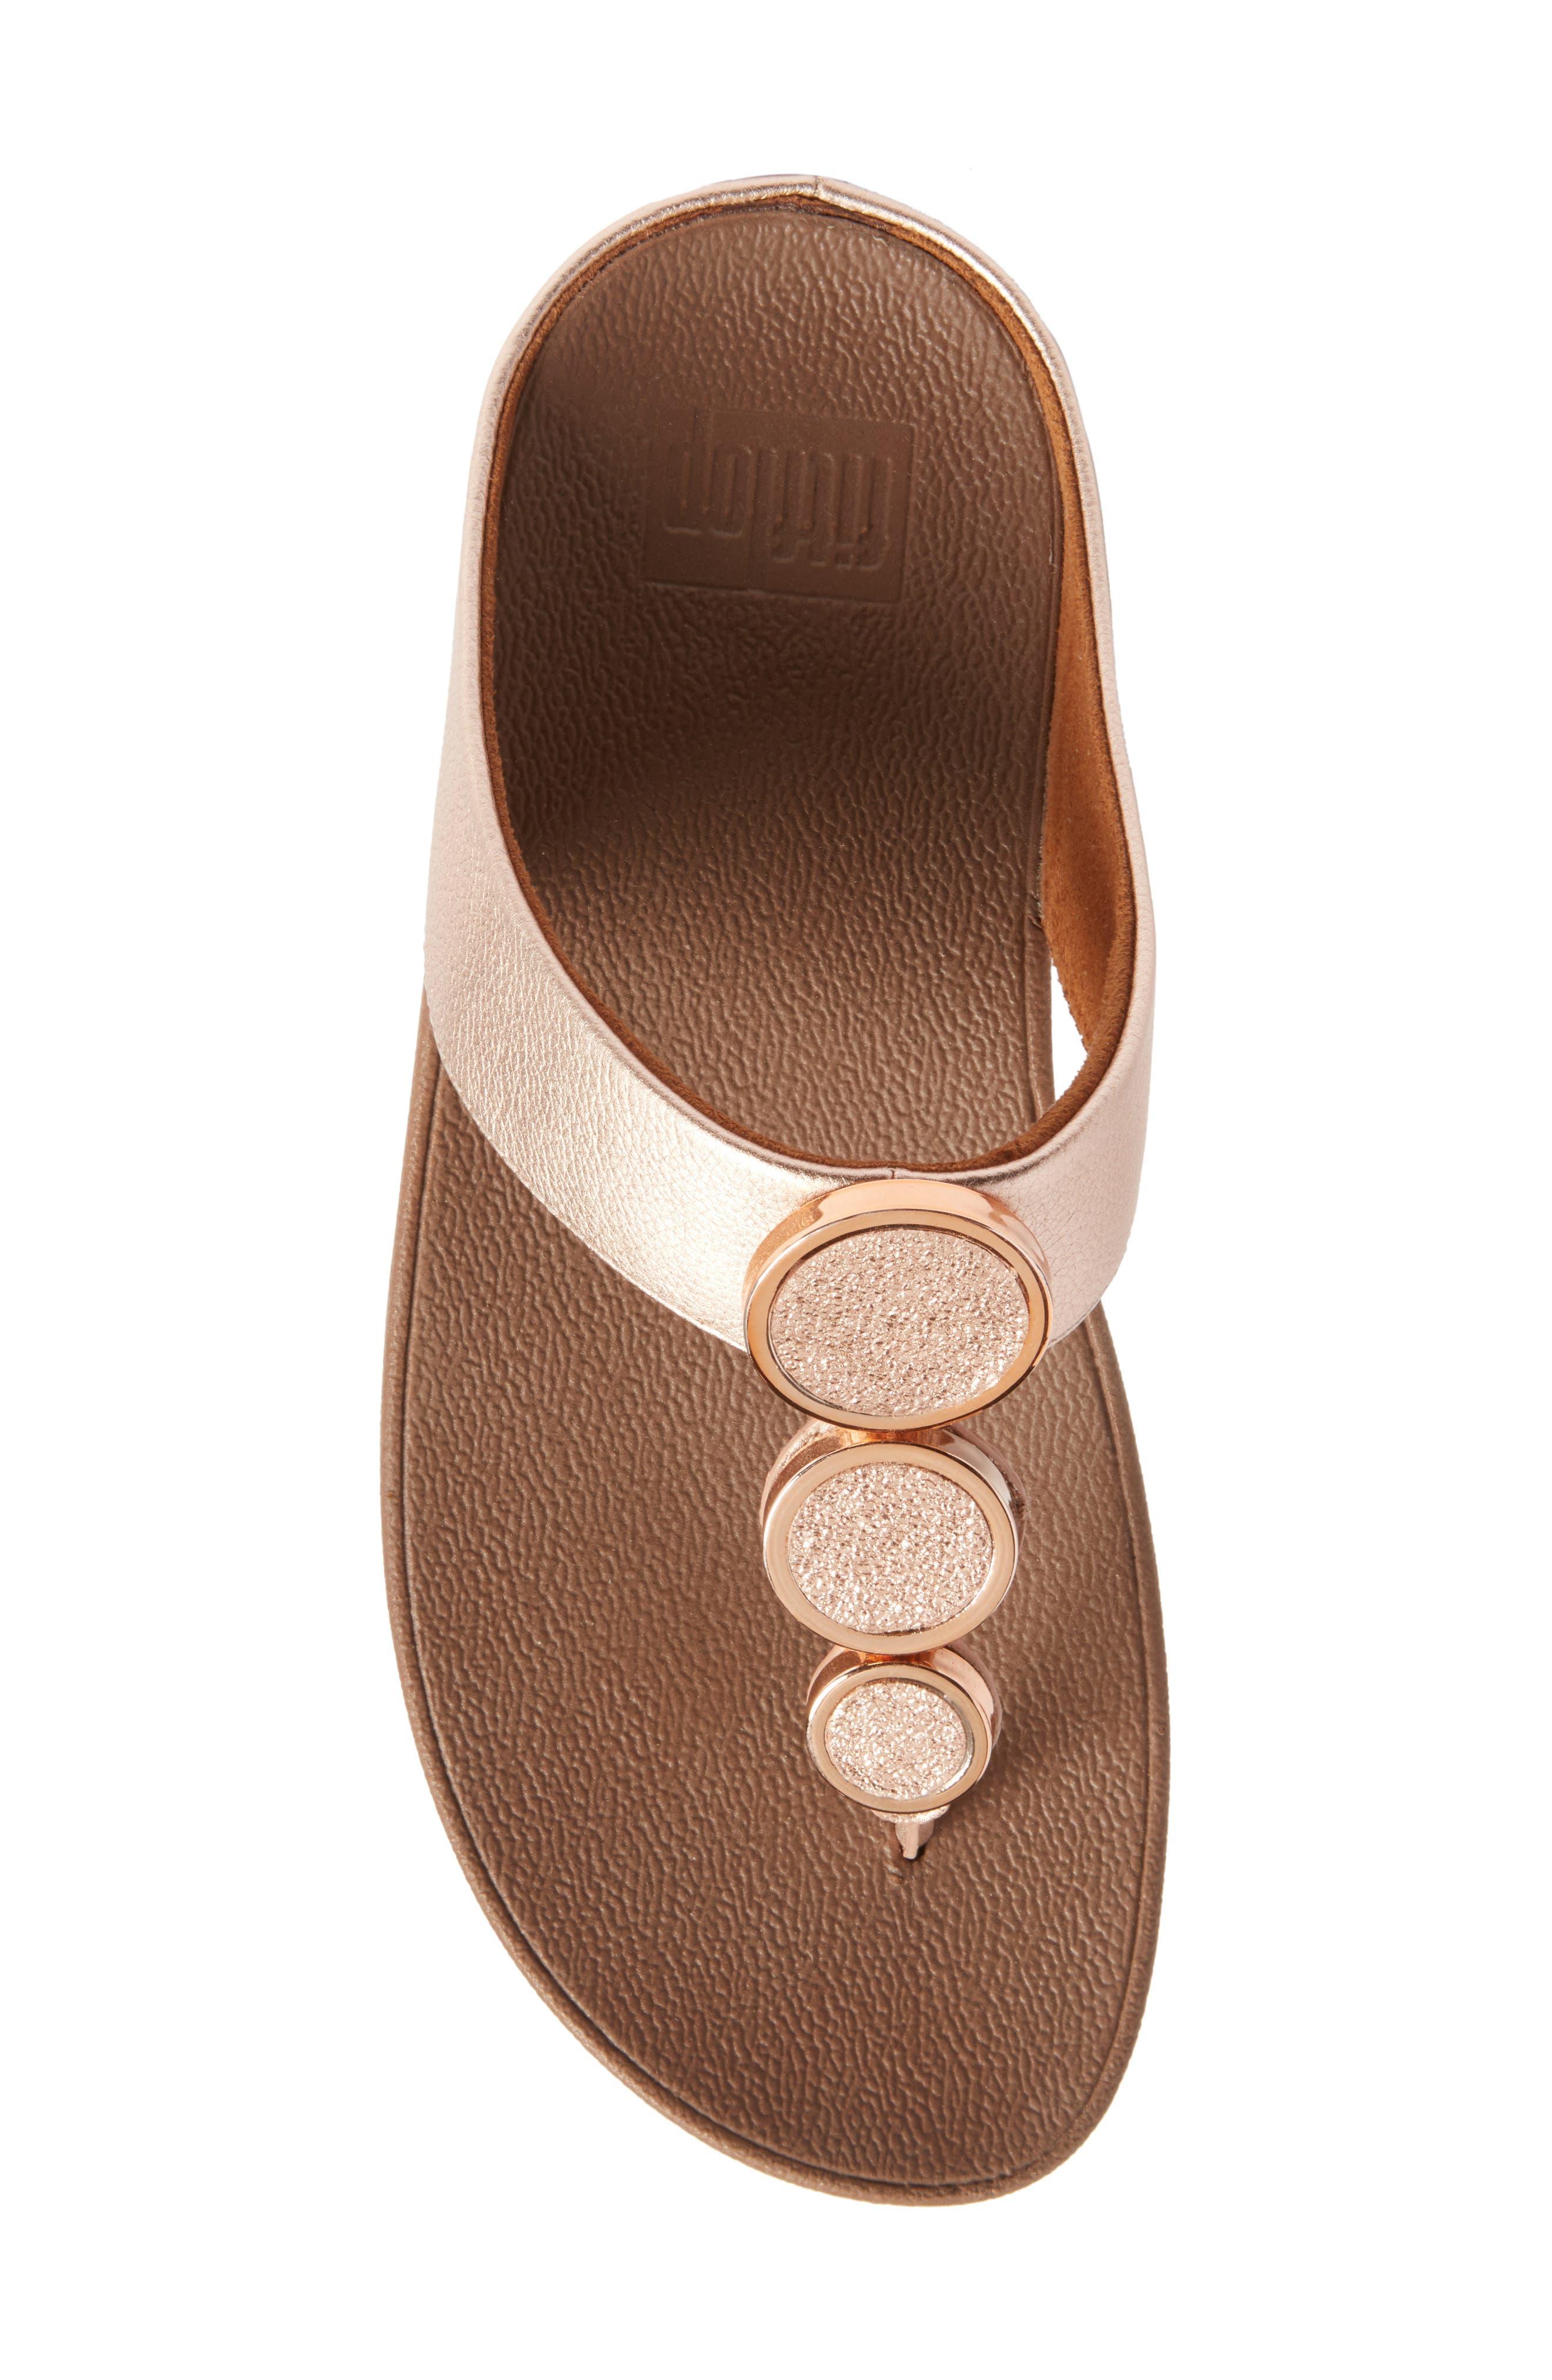 Halo Sandal,                             Alternate thumbnail 5, color,                             Rose Gold Leather